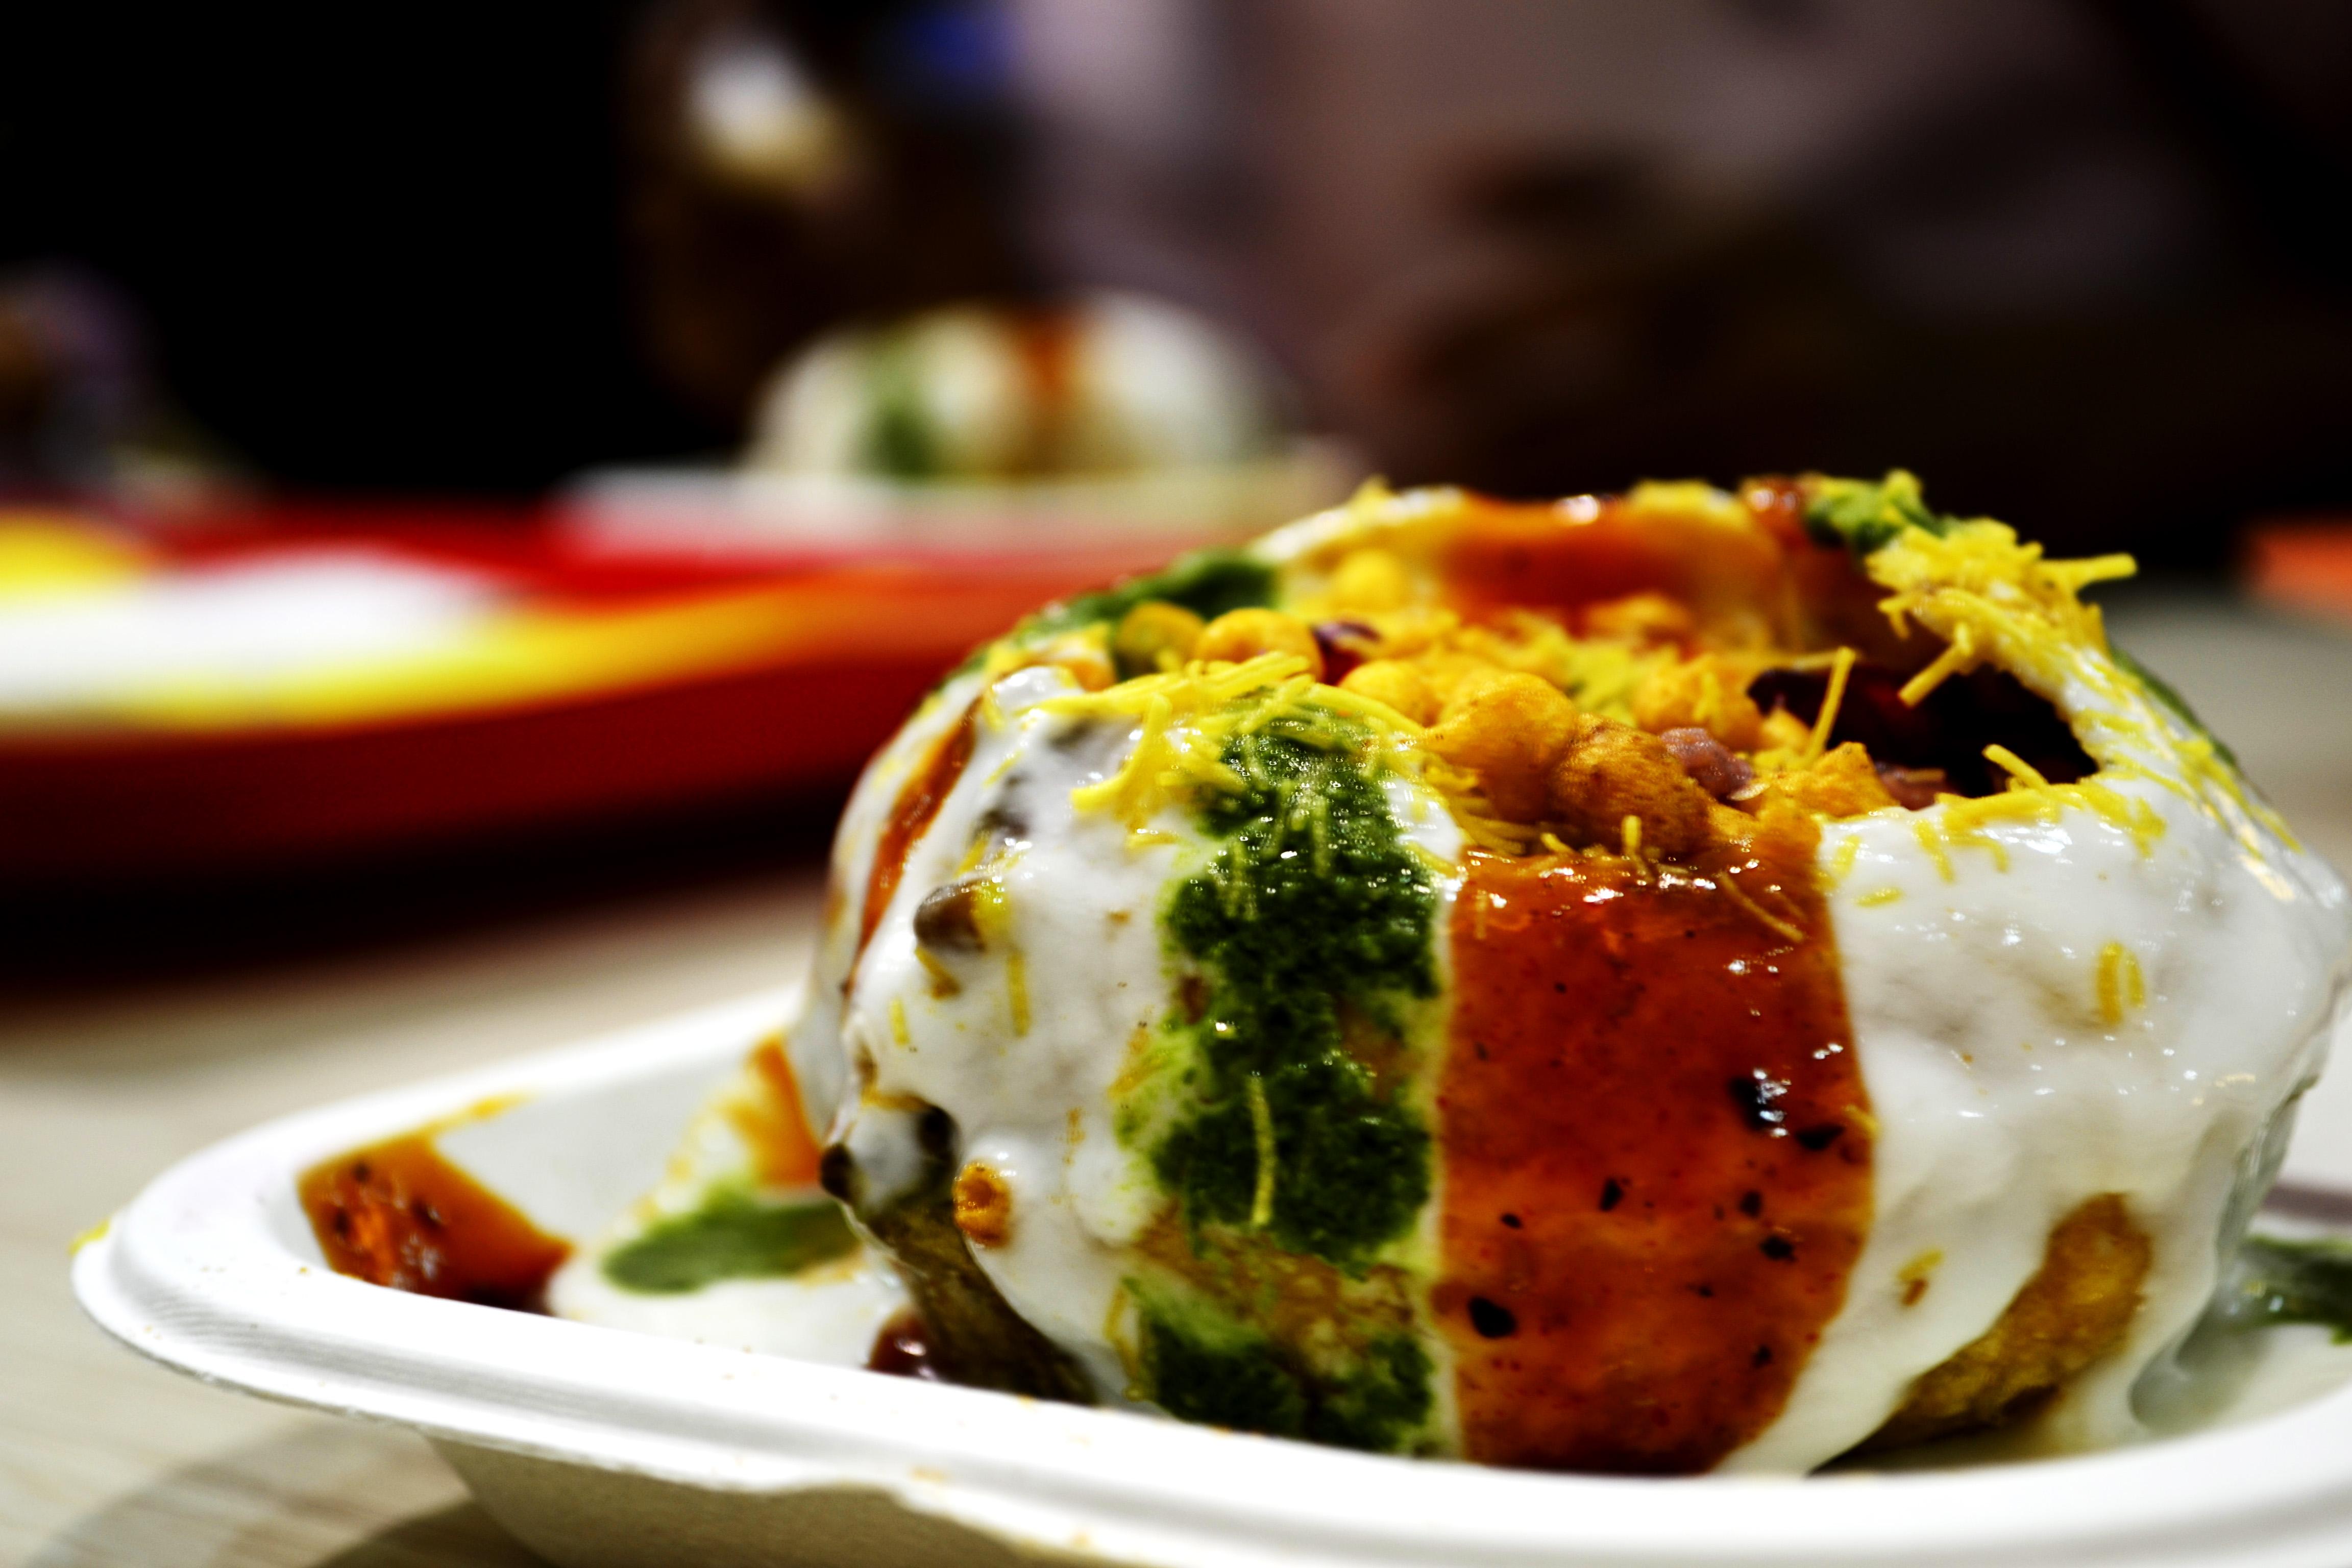 The 10 Best Breakfast And Brunch Spots In New Delhis